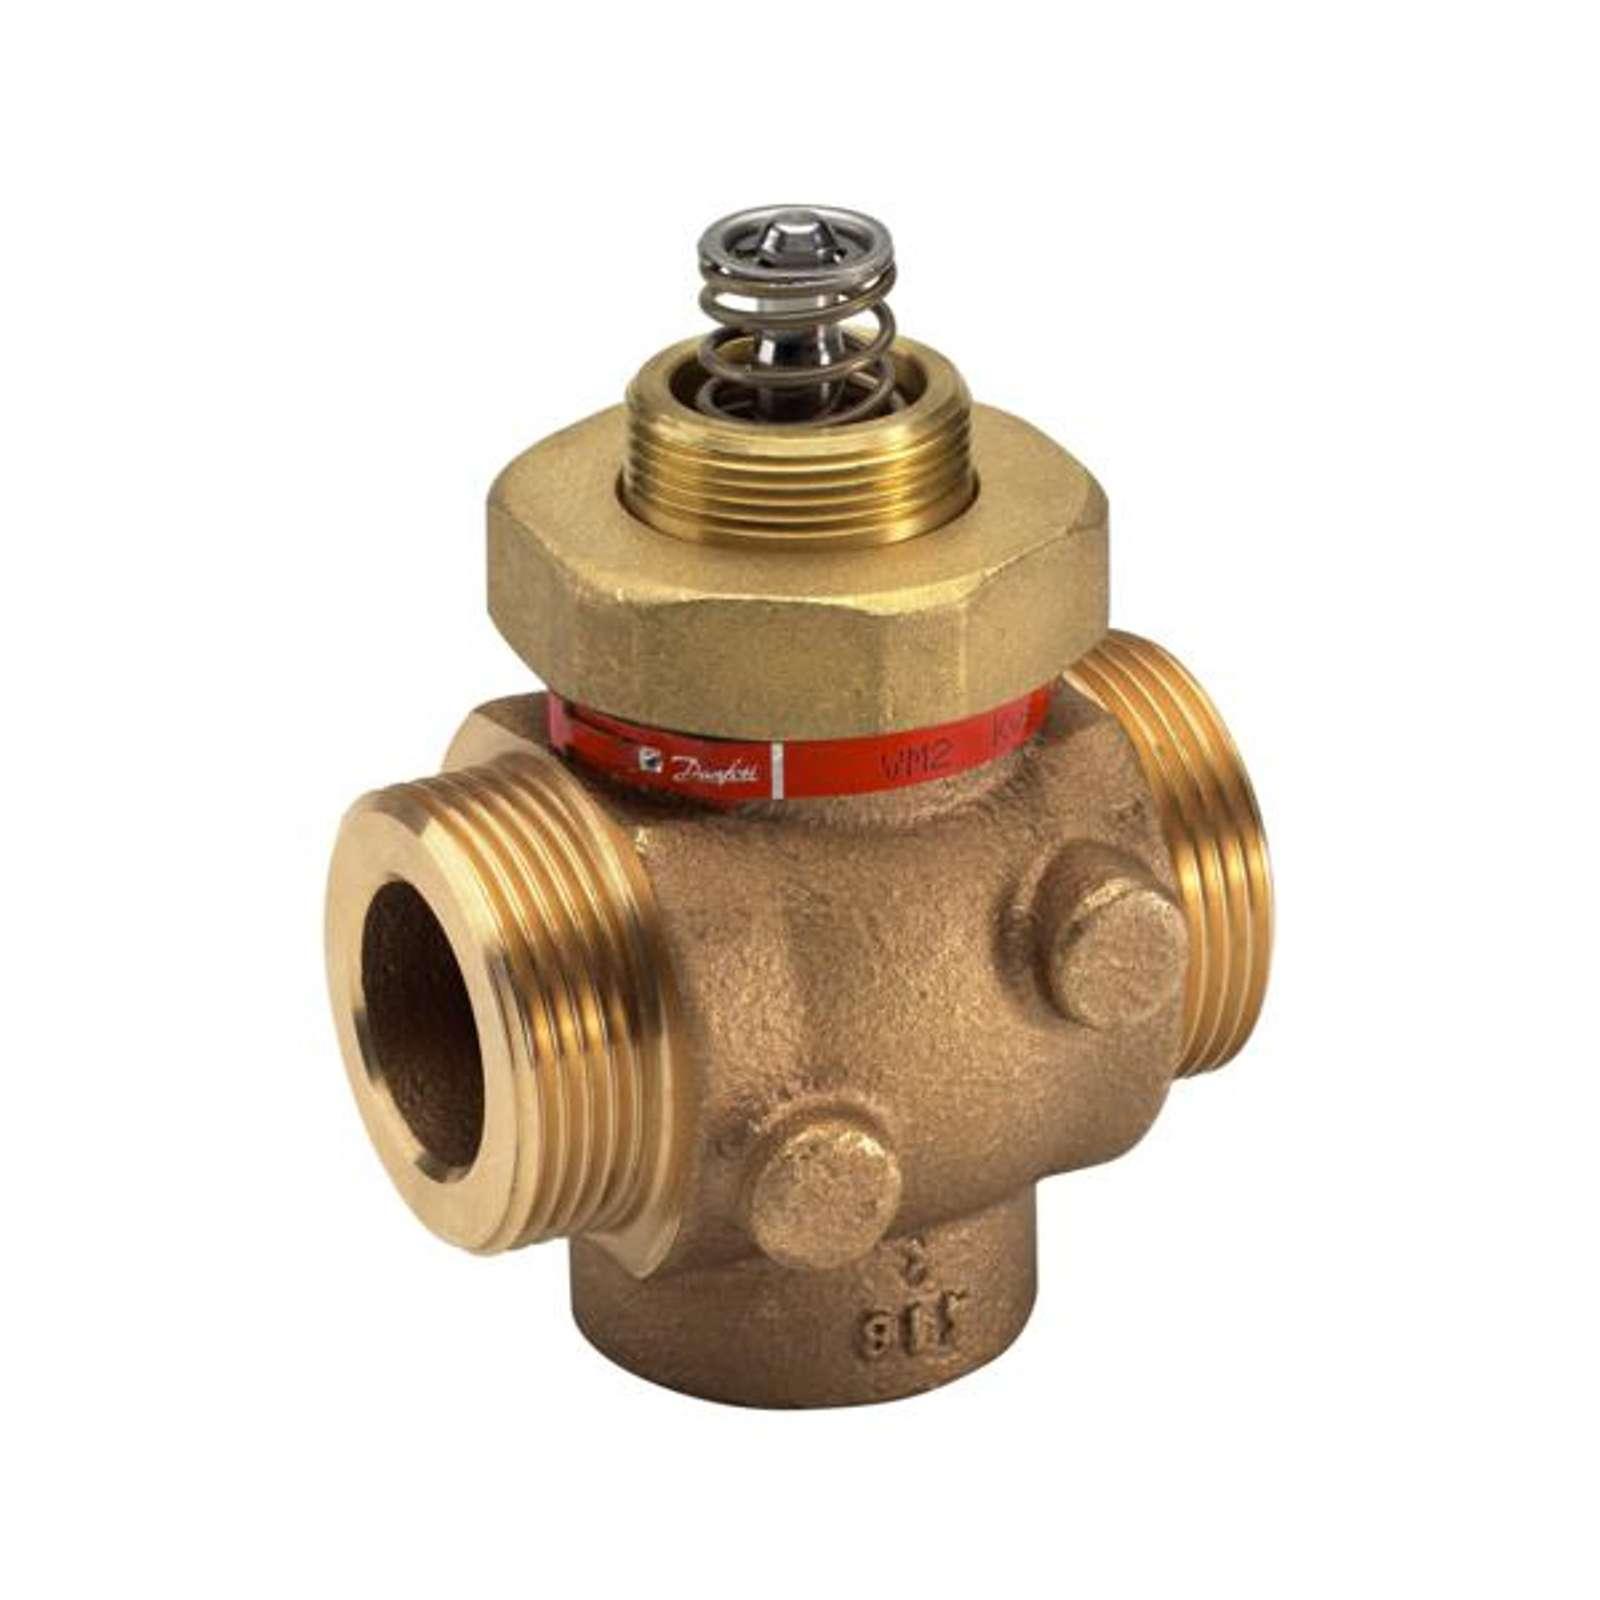 Клапан регулирующий VM2 Ду 25/6,3 Danfoss